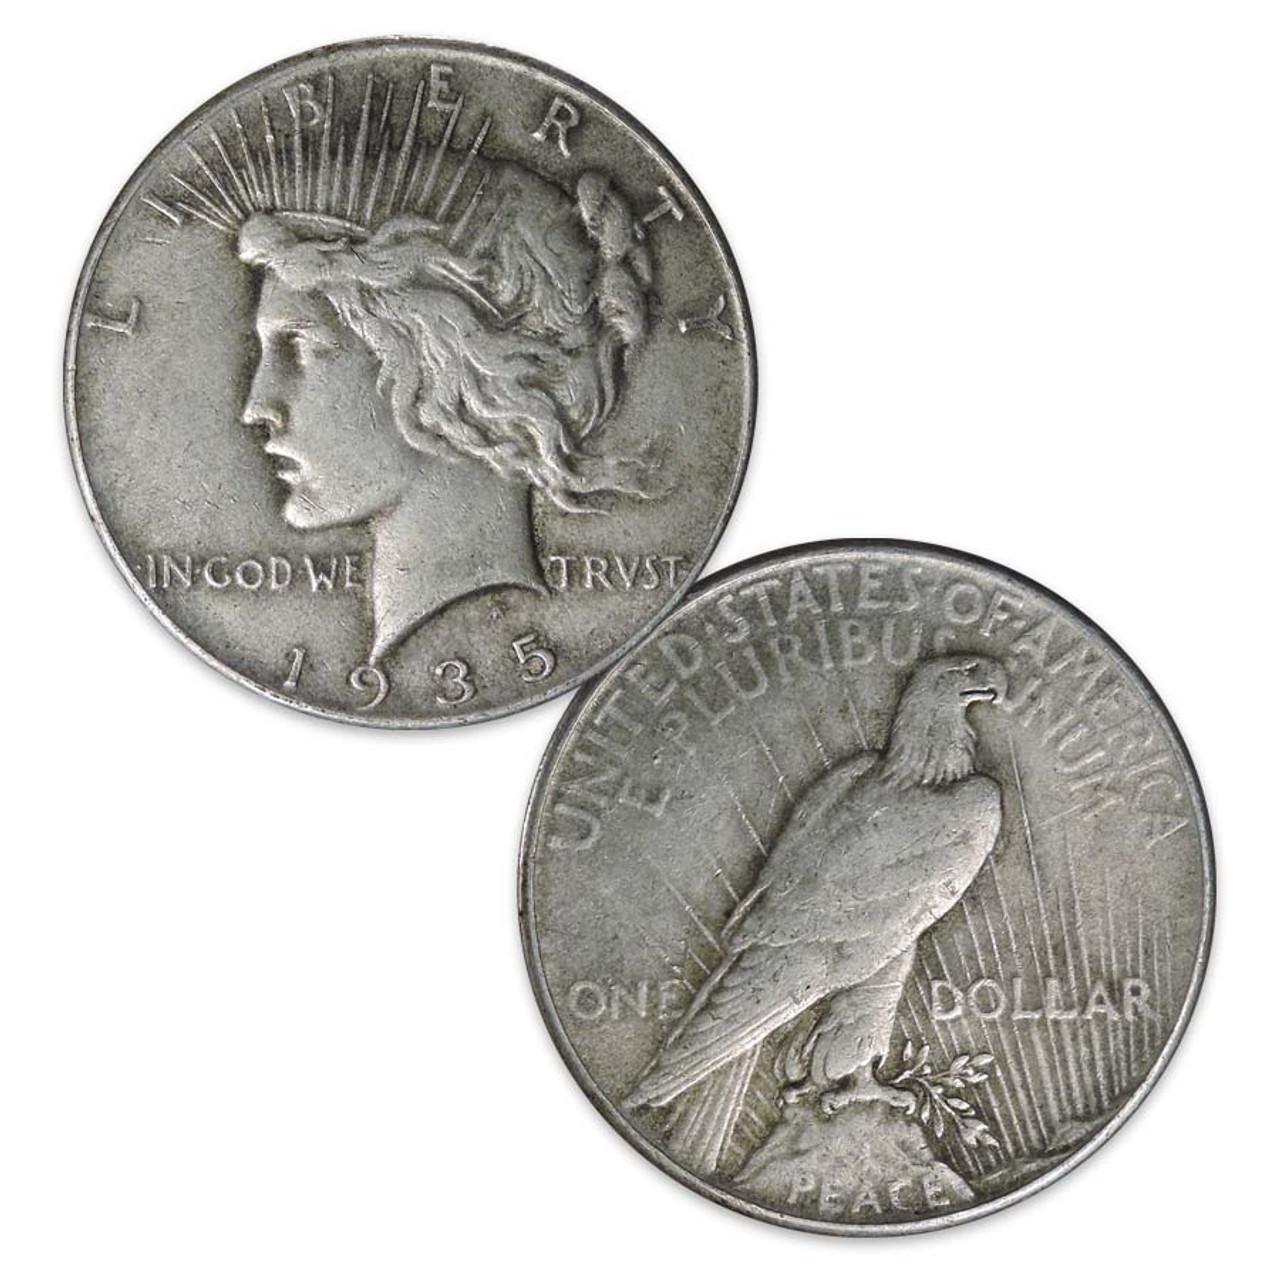 1935-P Peace Silver Dollar Very Fine Image 1